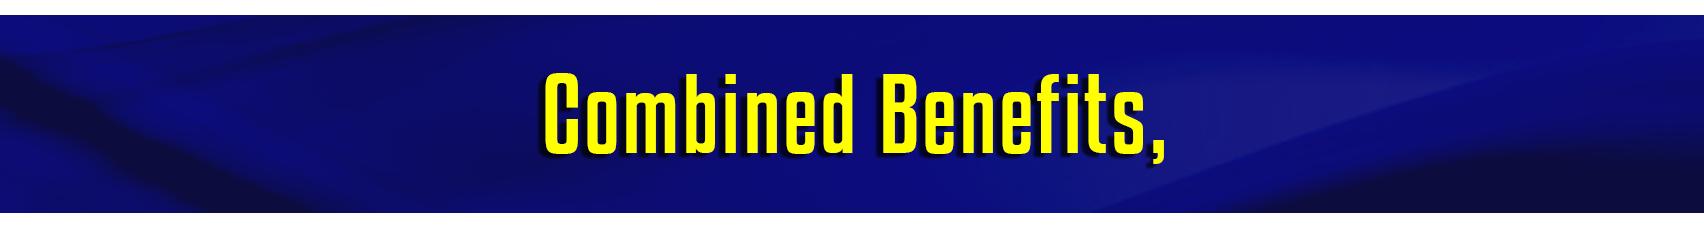 Combined Benefits